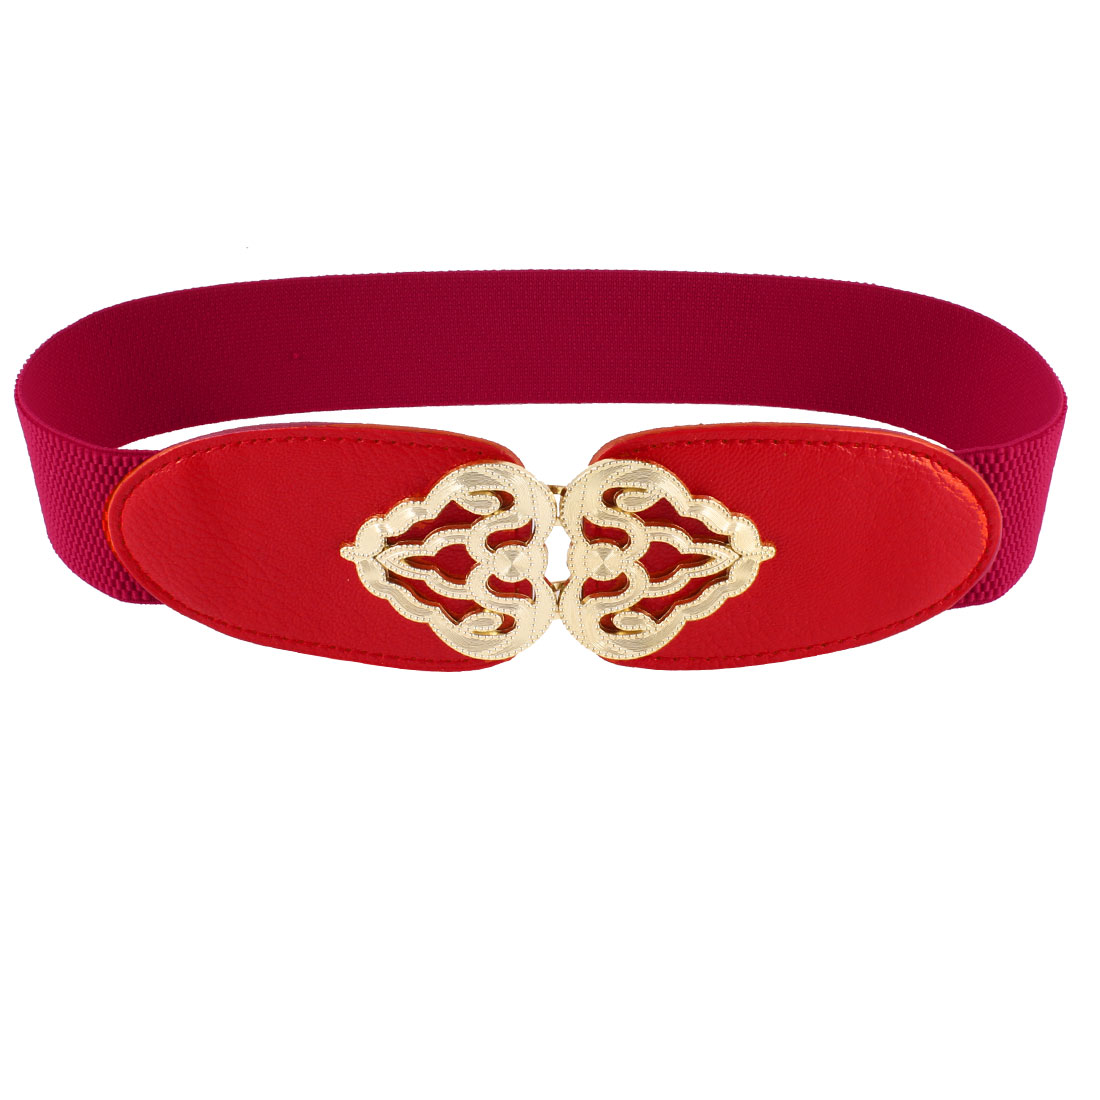 Interlocking Closure Elastic Waistband Cinch Belt 4CM Width Red for Woman